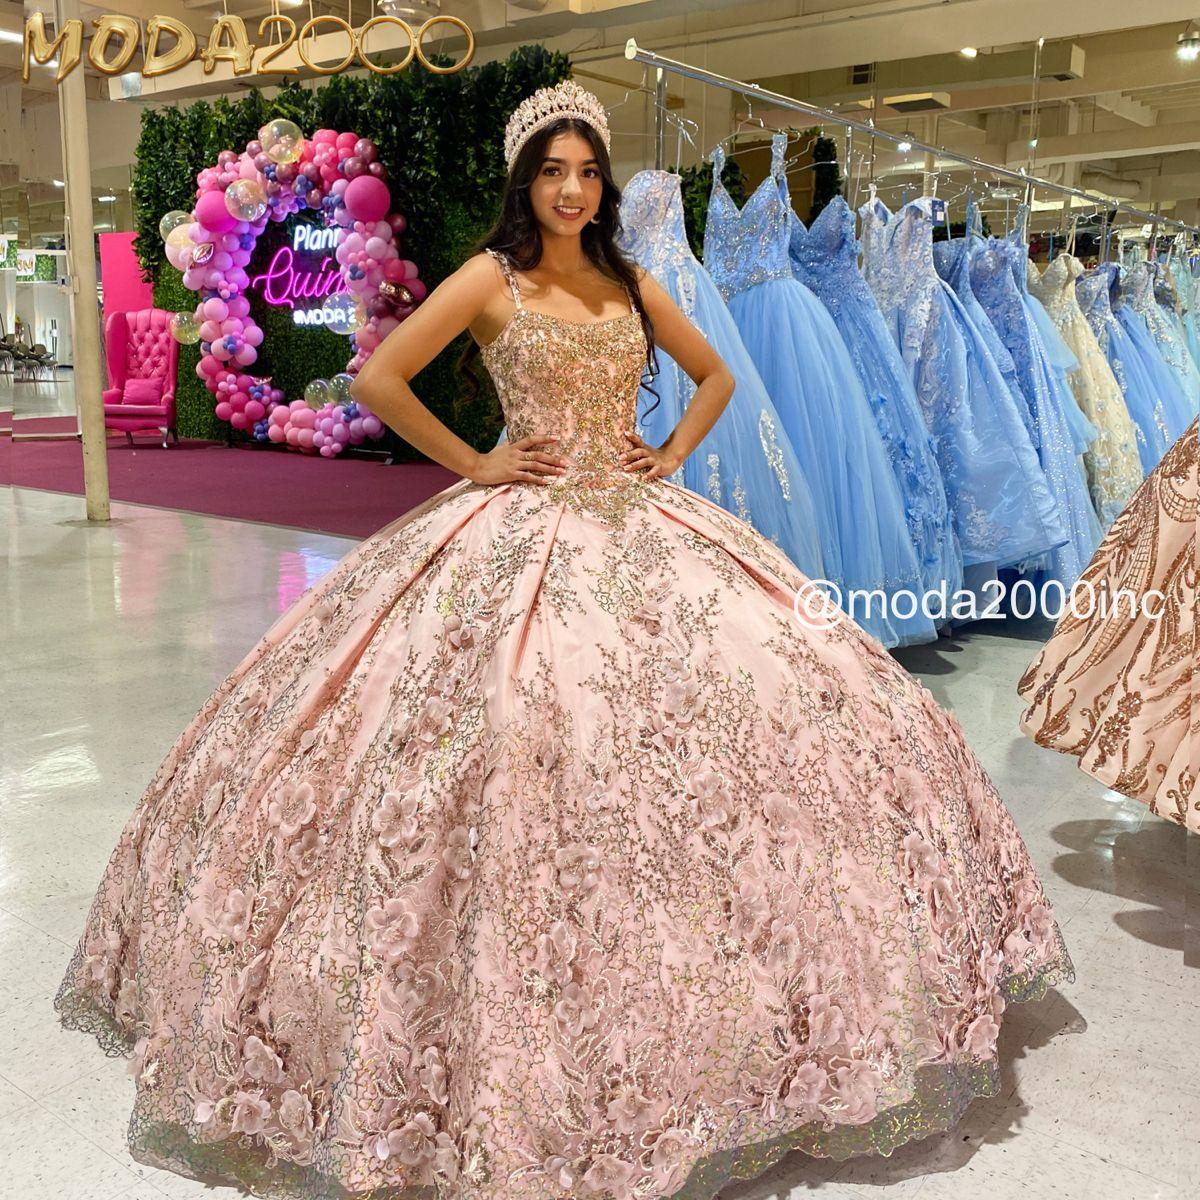 Blush Pink Rose Gold Quinceanera Dress Quinceanera Dresses Gold Rose Gold Quinceanera Dresses 15 Dresses Quinceanera